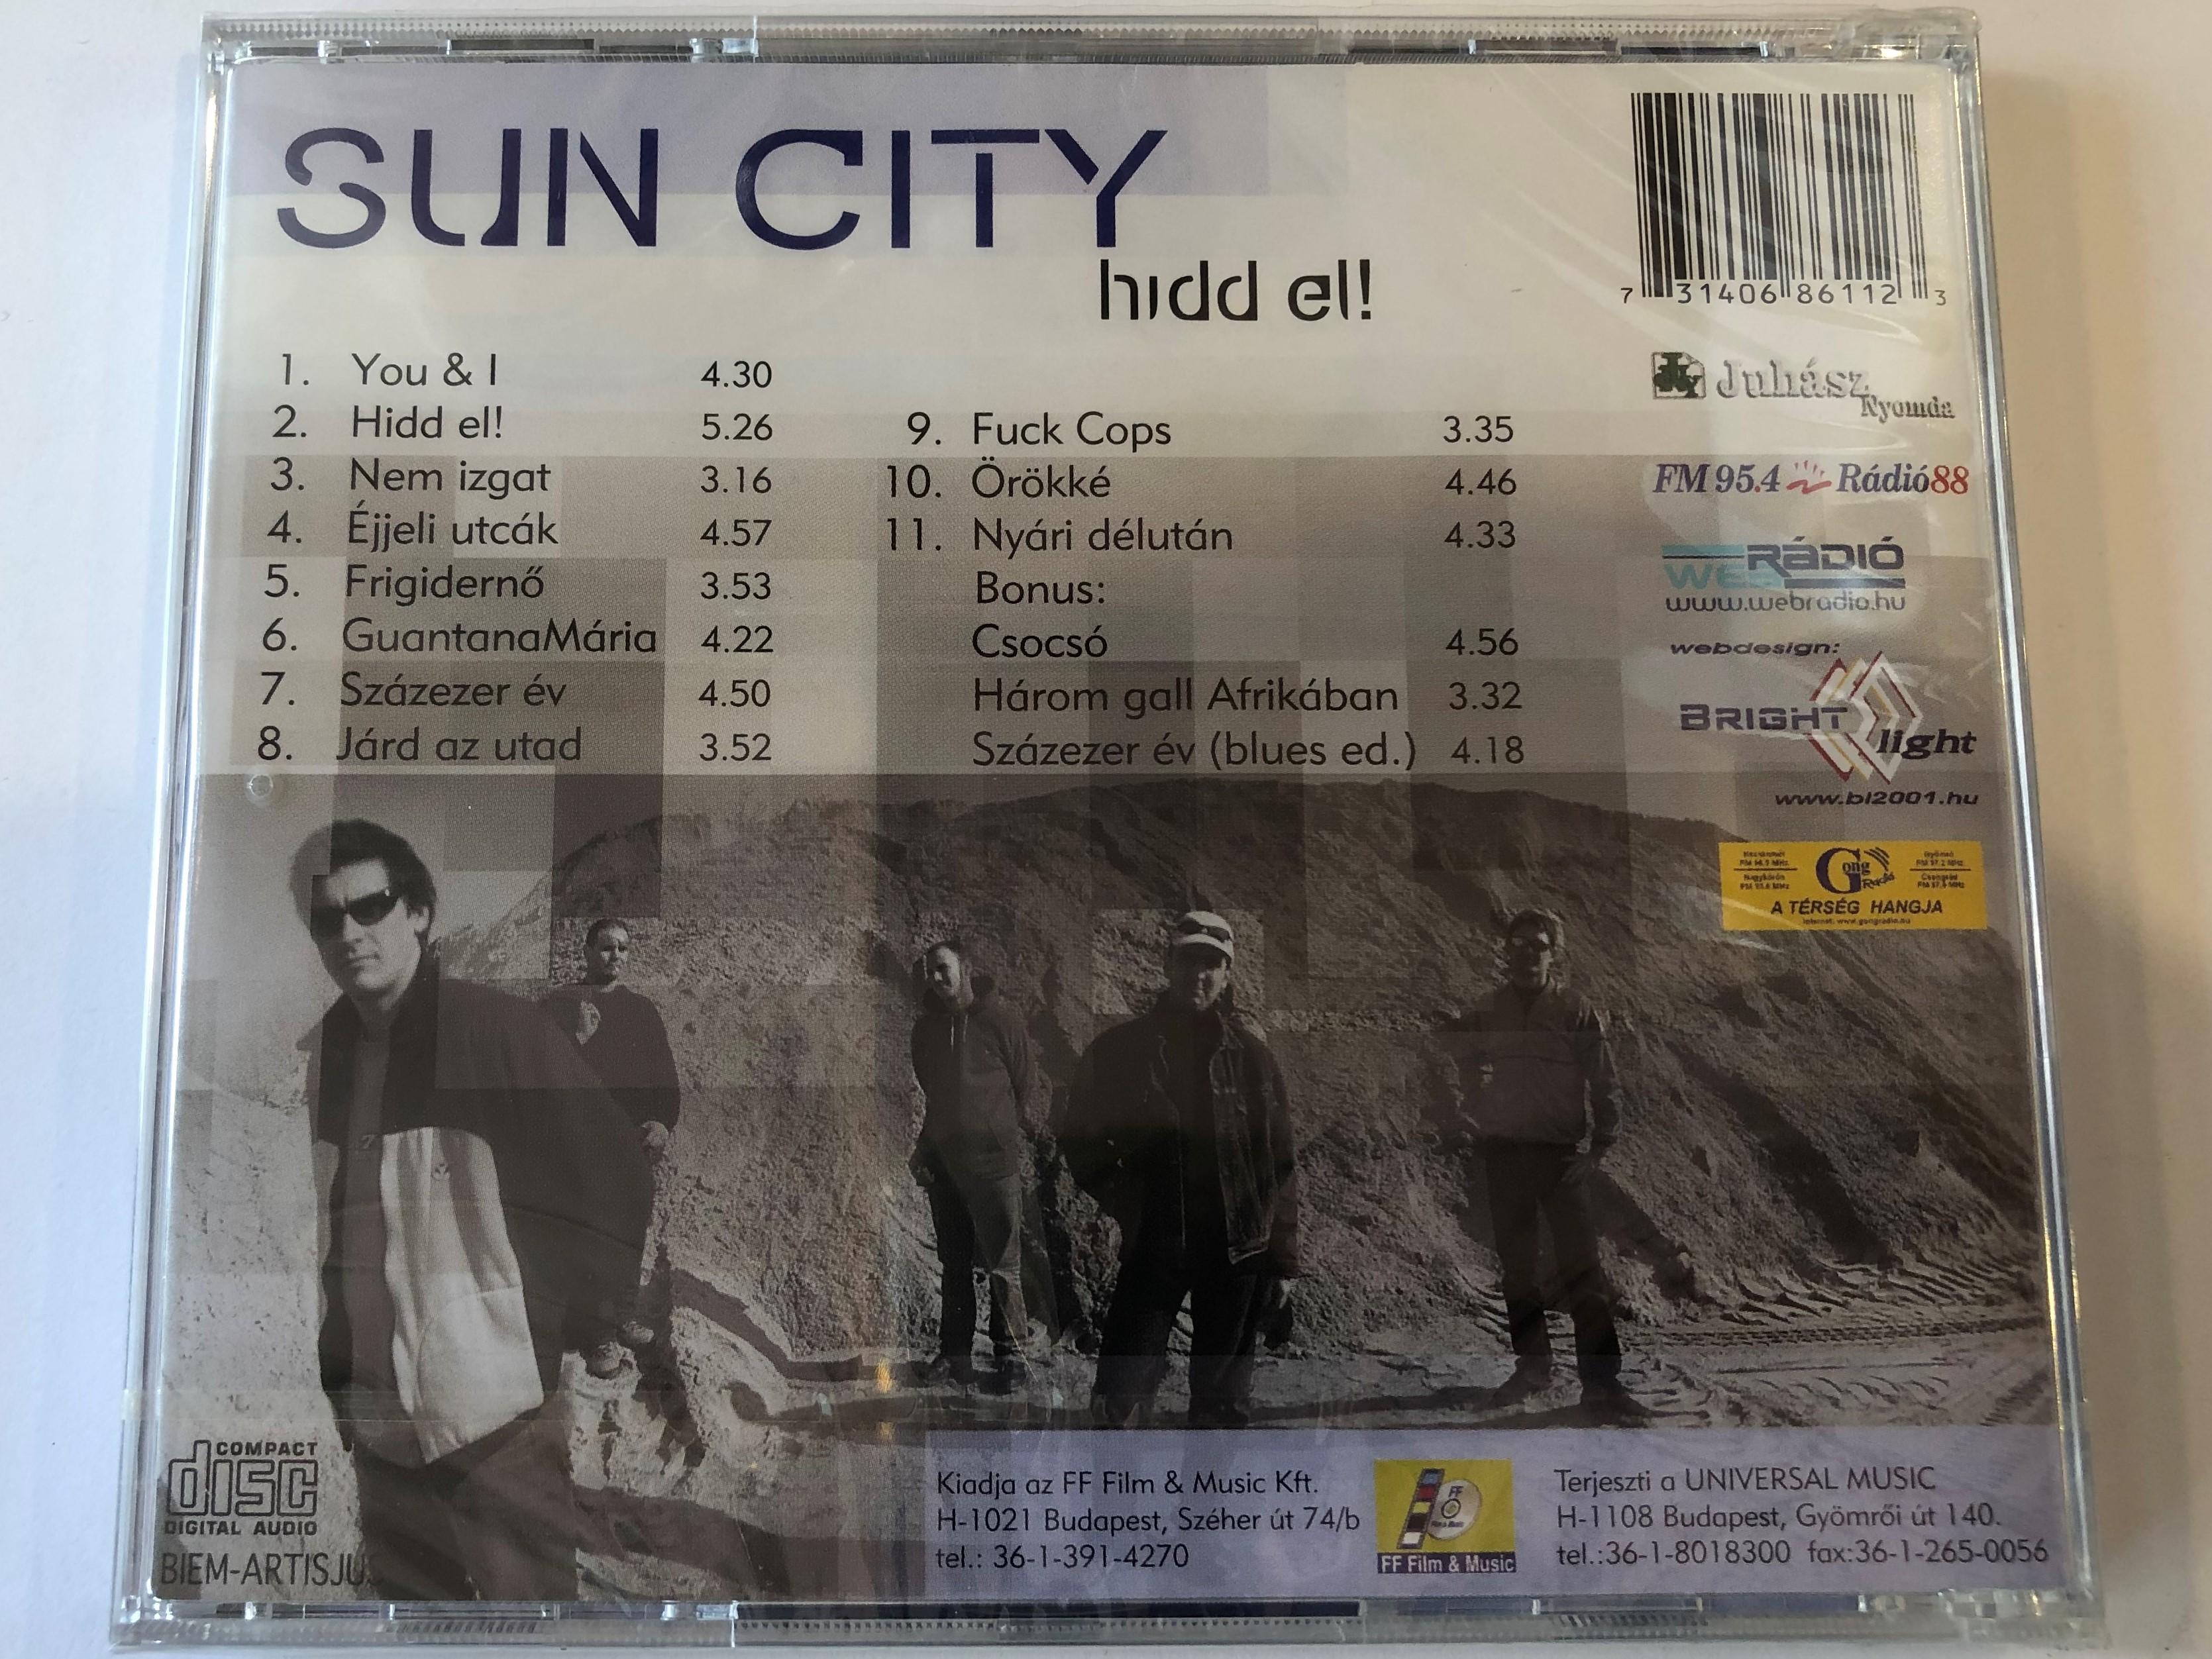 sun-city-hidd-el-ff-film-music-audio-cd-731406861123-2-.jpg